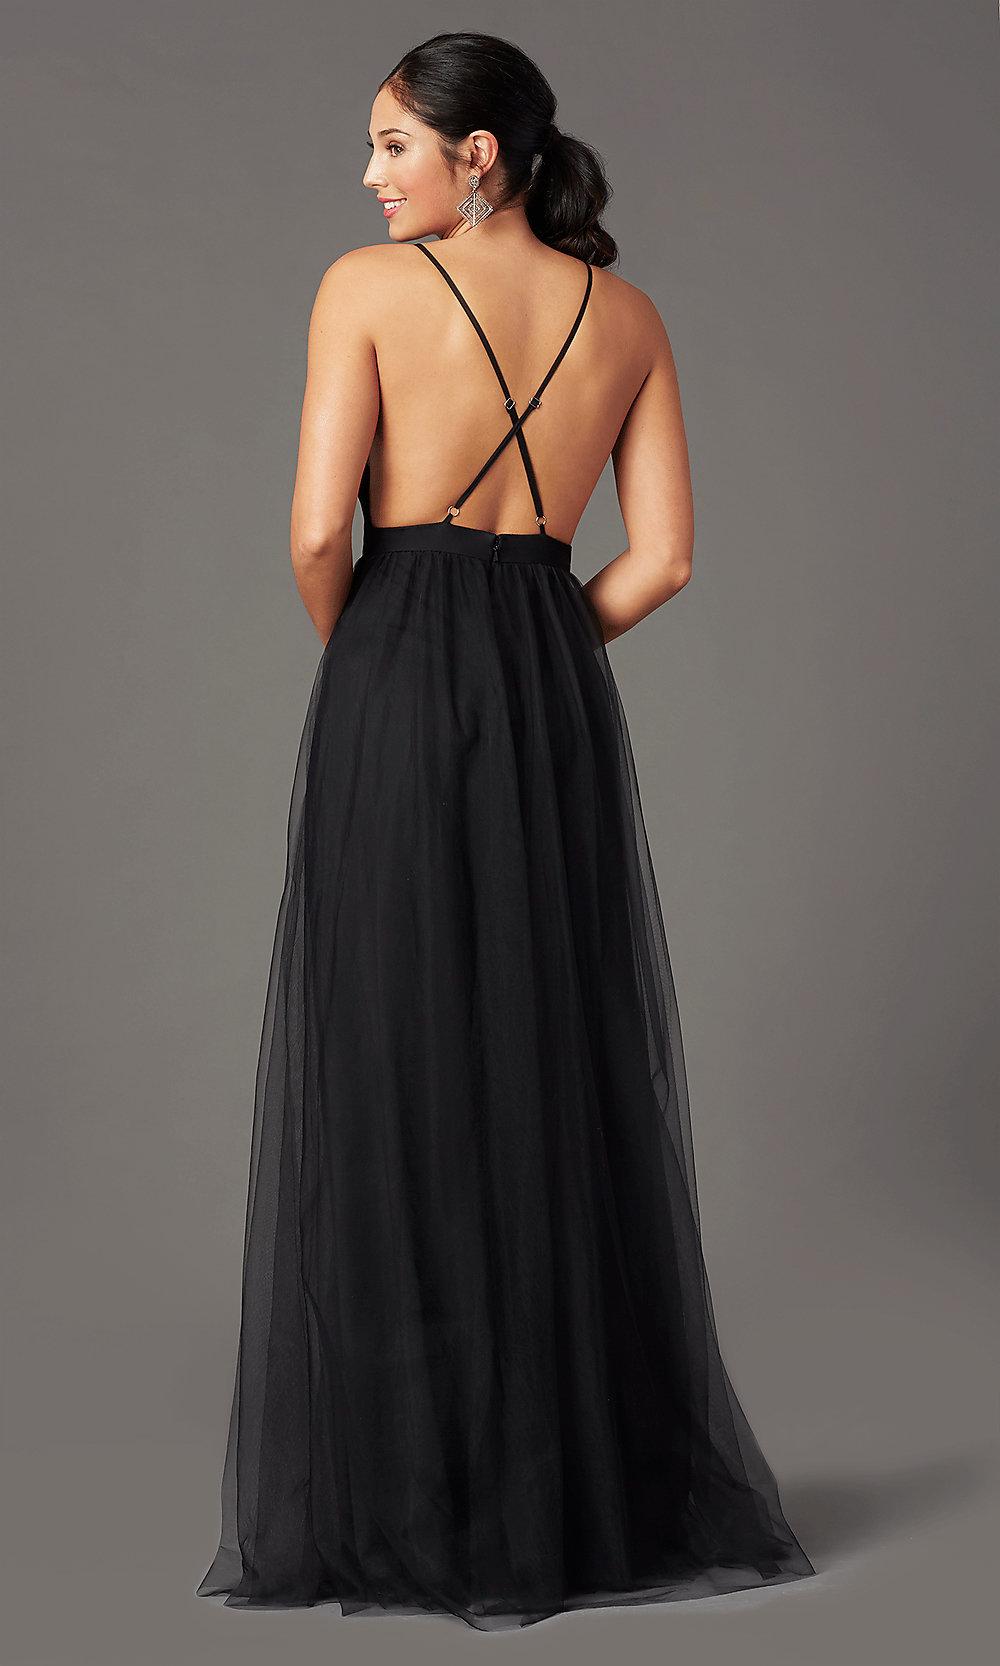 Open back blacked prom dress back-side